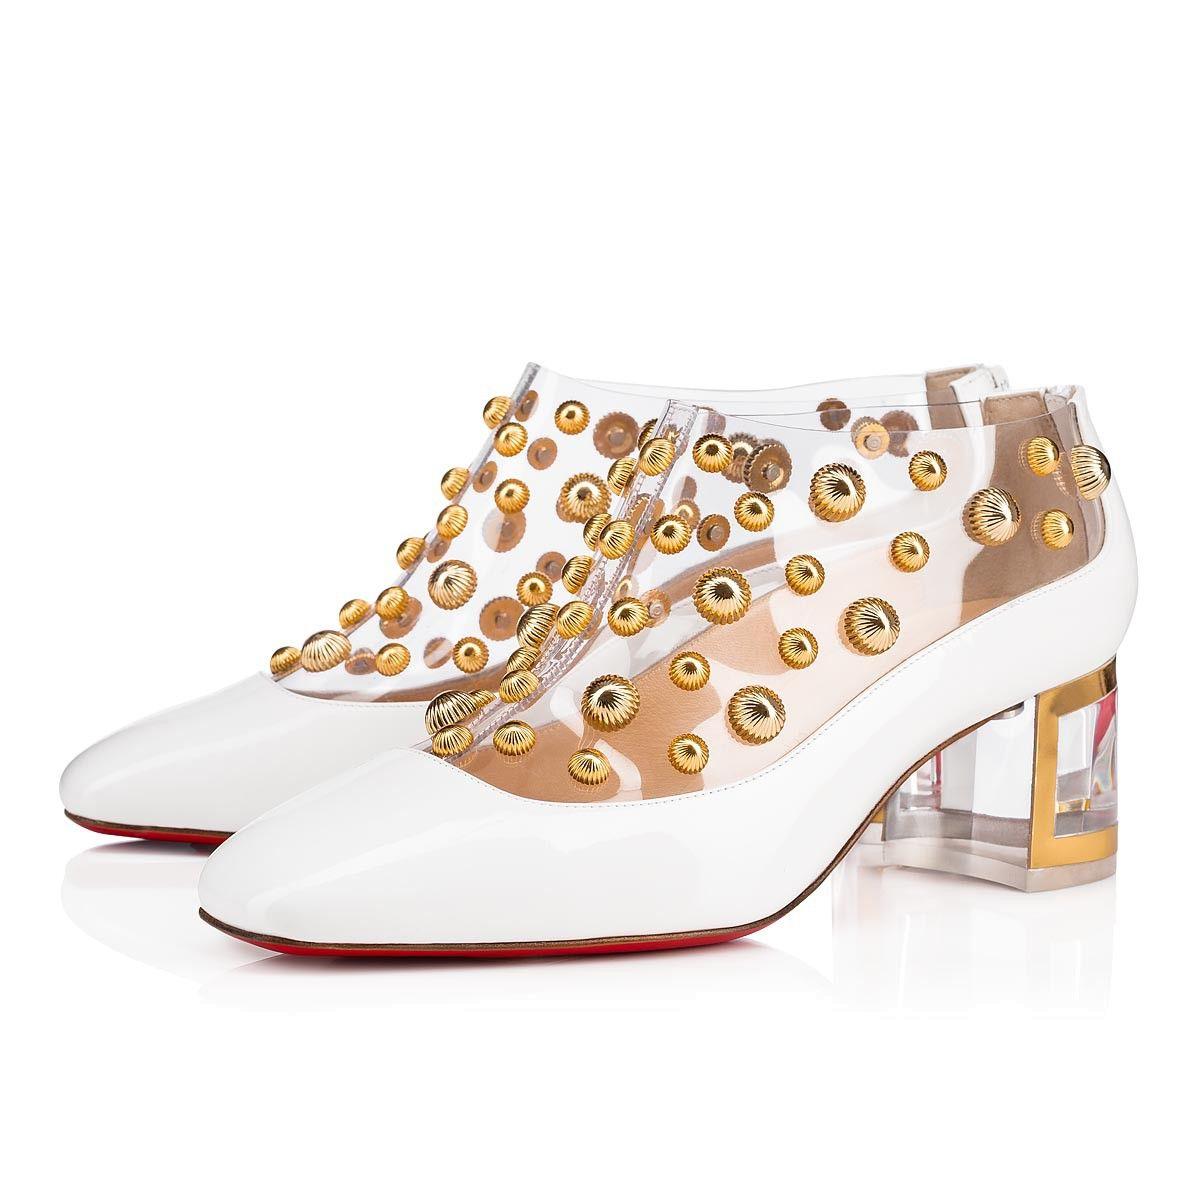 c0d553ba0a2 Shoes - Space Odd - Christian Louboutin   Designer Office Heels ...